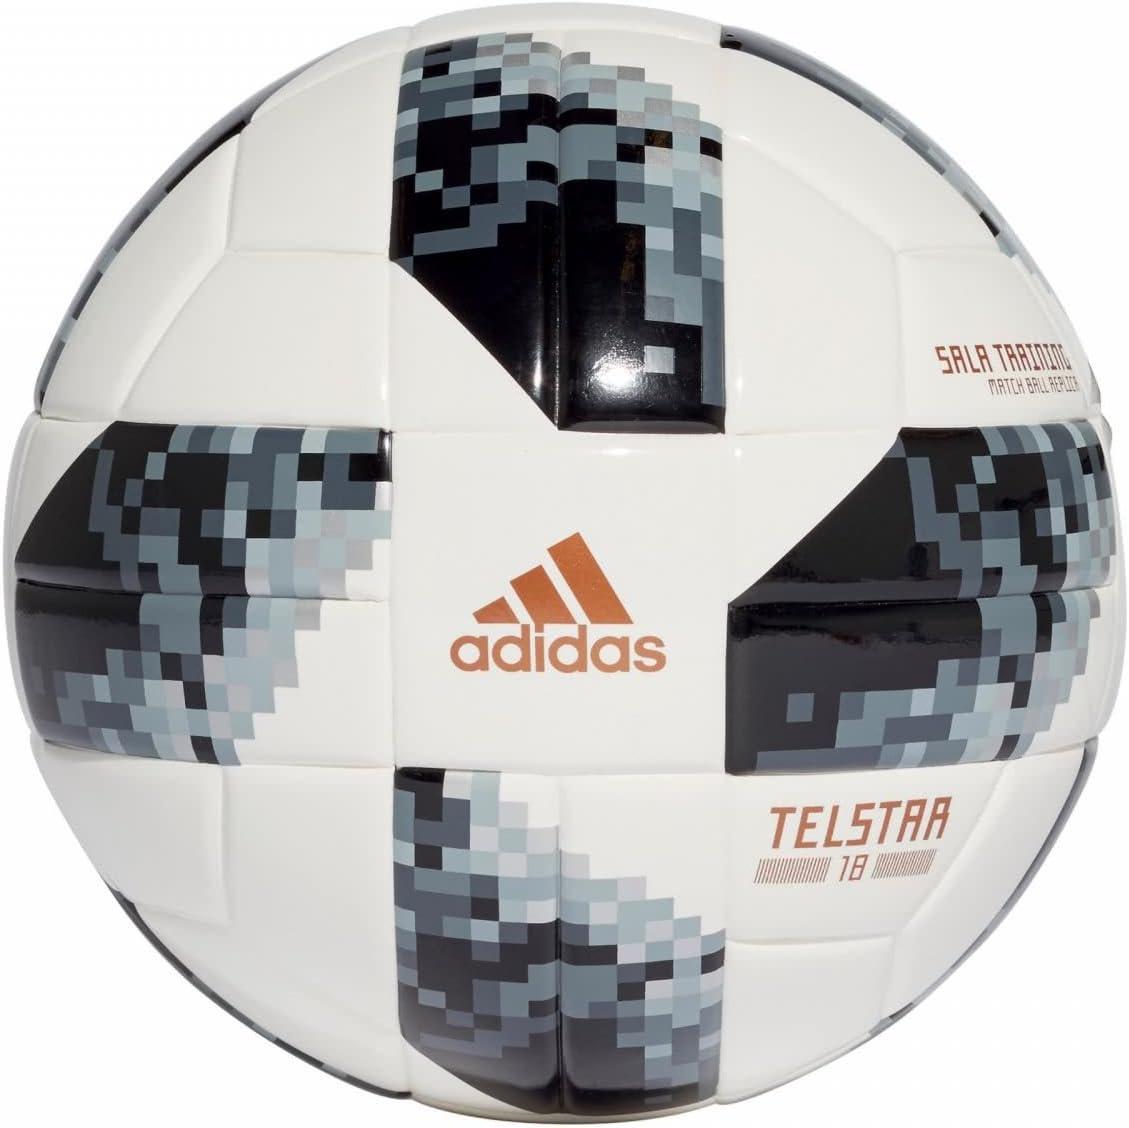 adidas World Cup SLTRN Balón, Hombre, Blanco/Negro/Plamet, FUTS ...